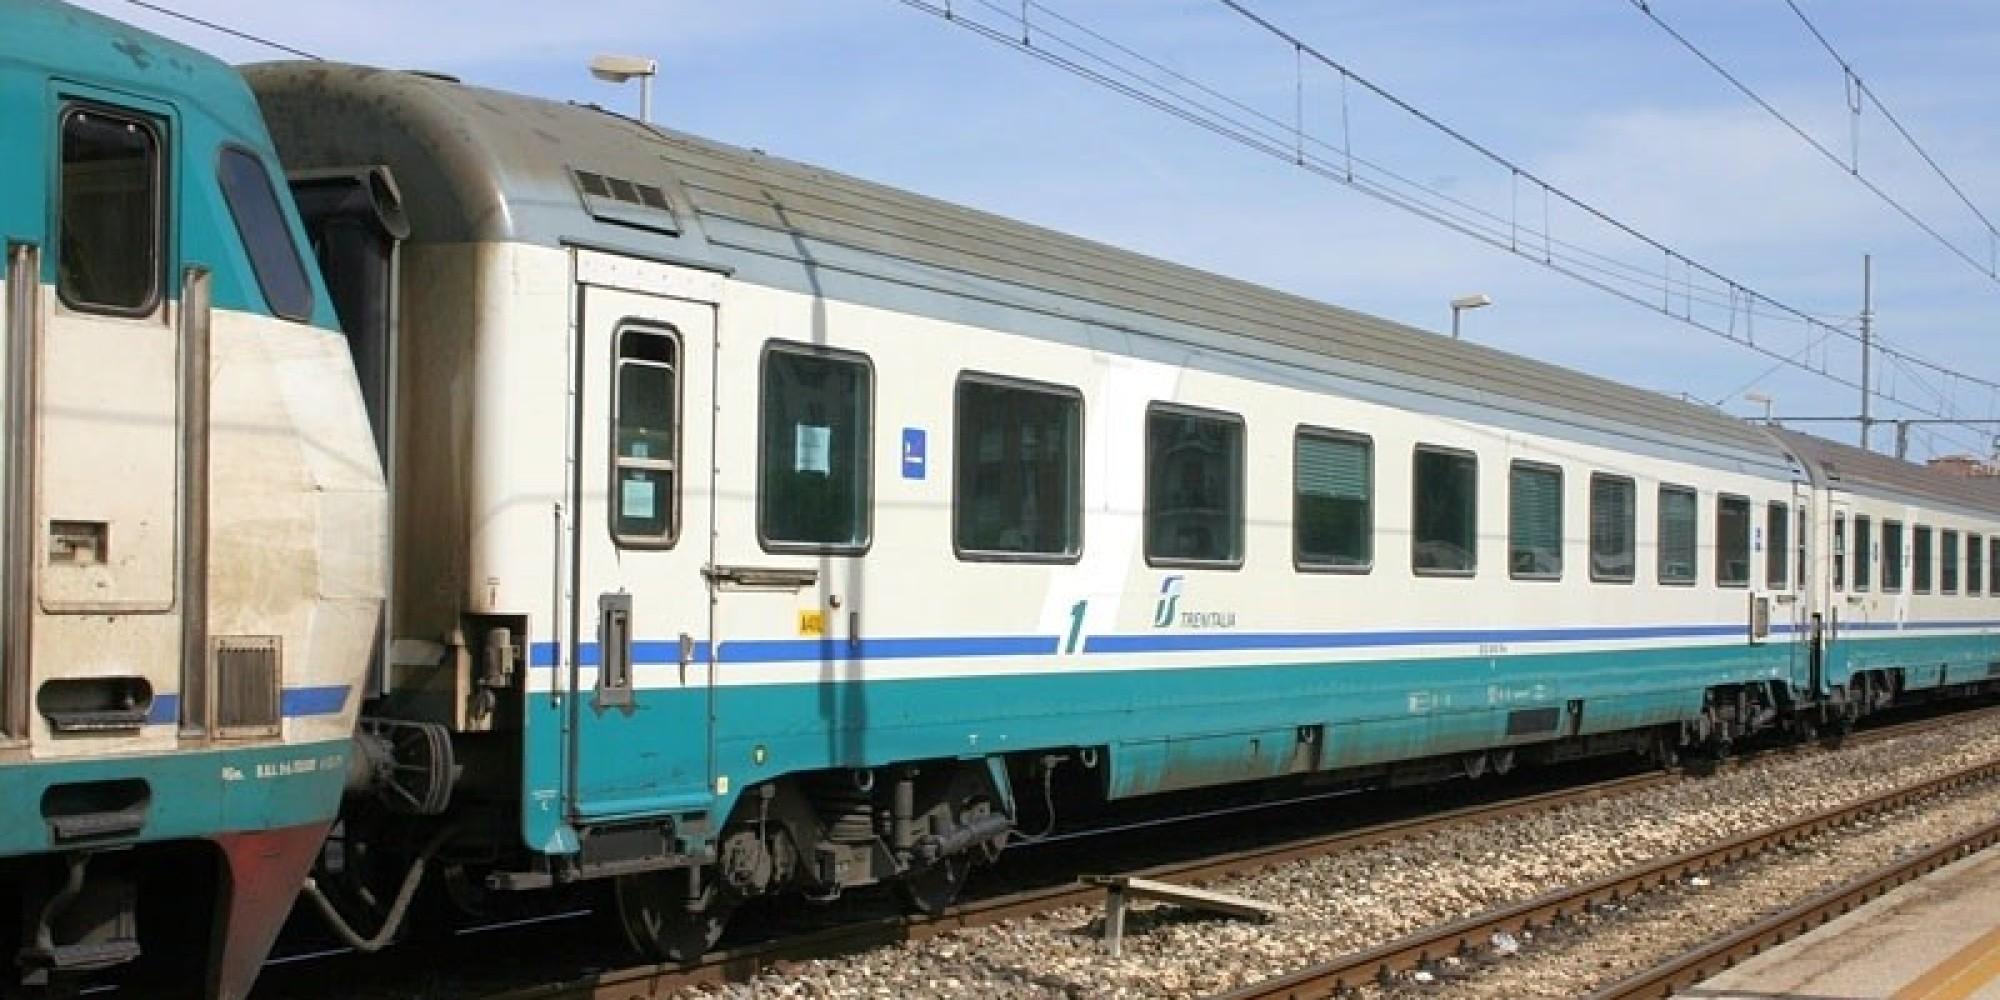 Intercity trenitalia li sopprimer da giugno il codacons - Trenitalia vagone letto ...